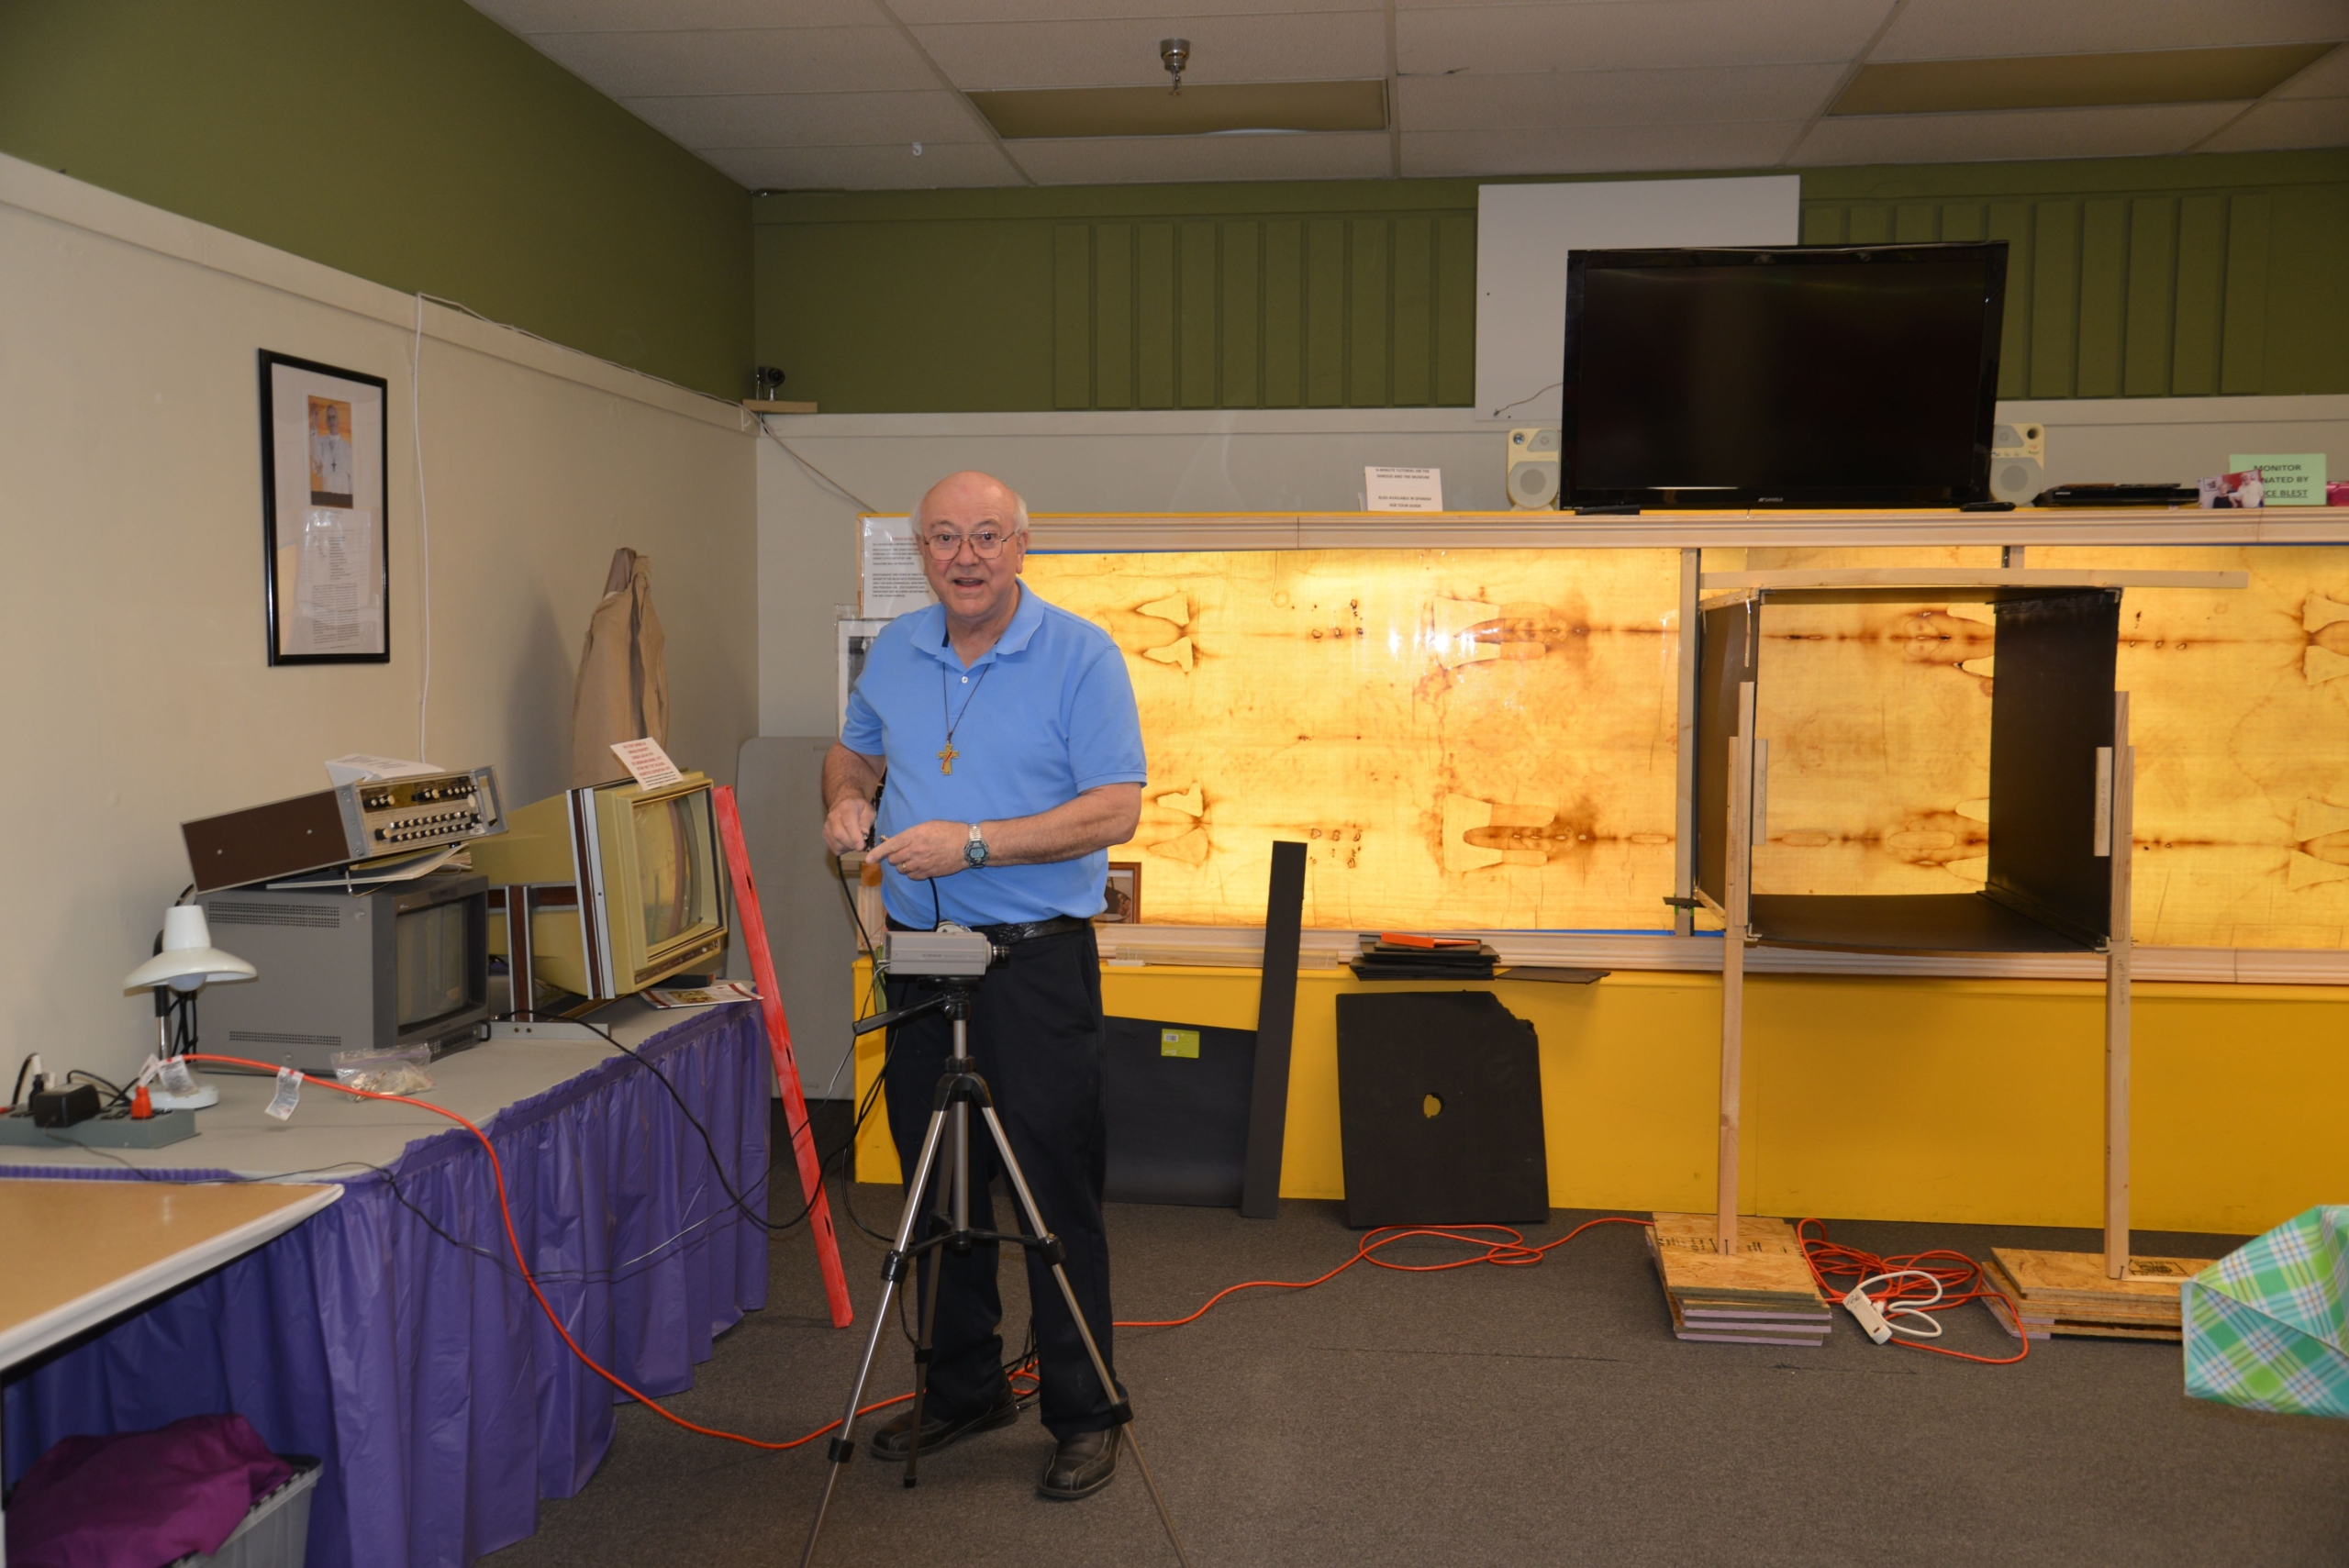 Photo C. Preparing research set-up